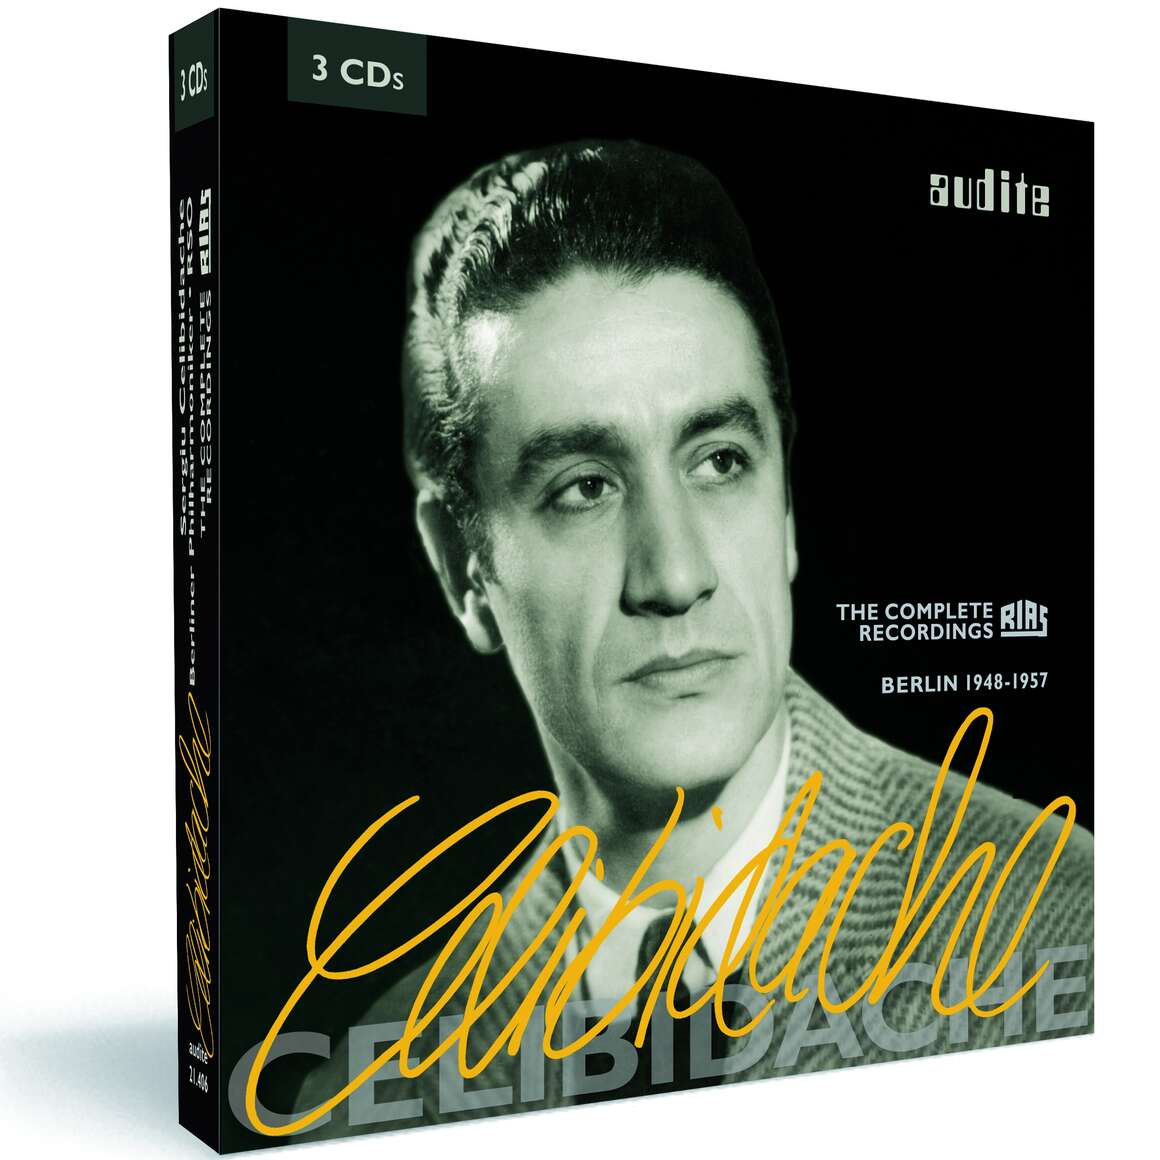 Edition Sergiu Celibidache | The complete RIAS recordings